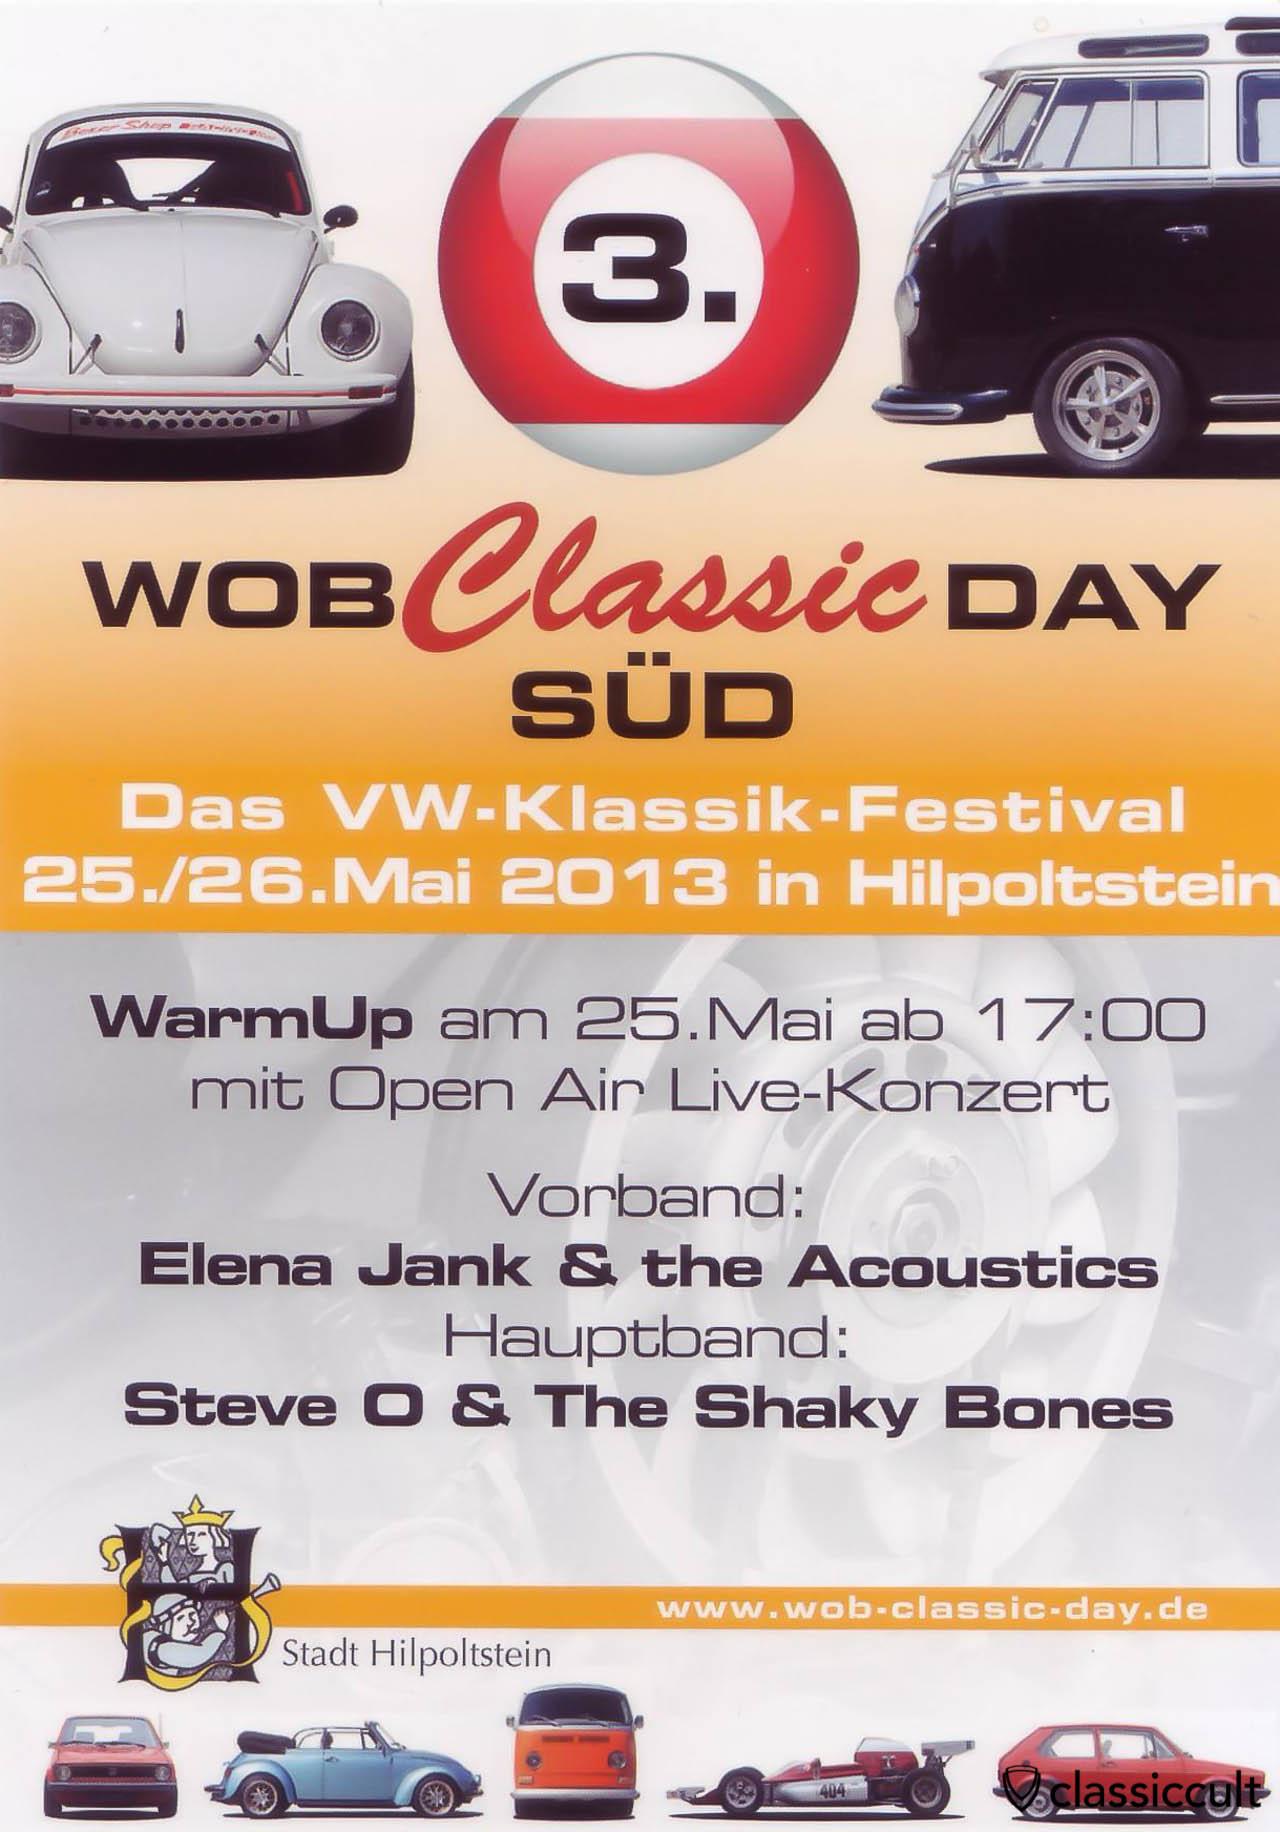 WOB Classic Day VW-Klassik-Festival 25.05.2013 - 26.05.2013 Flyer